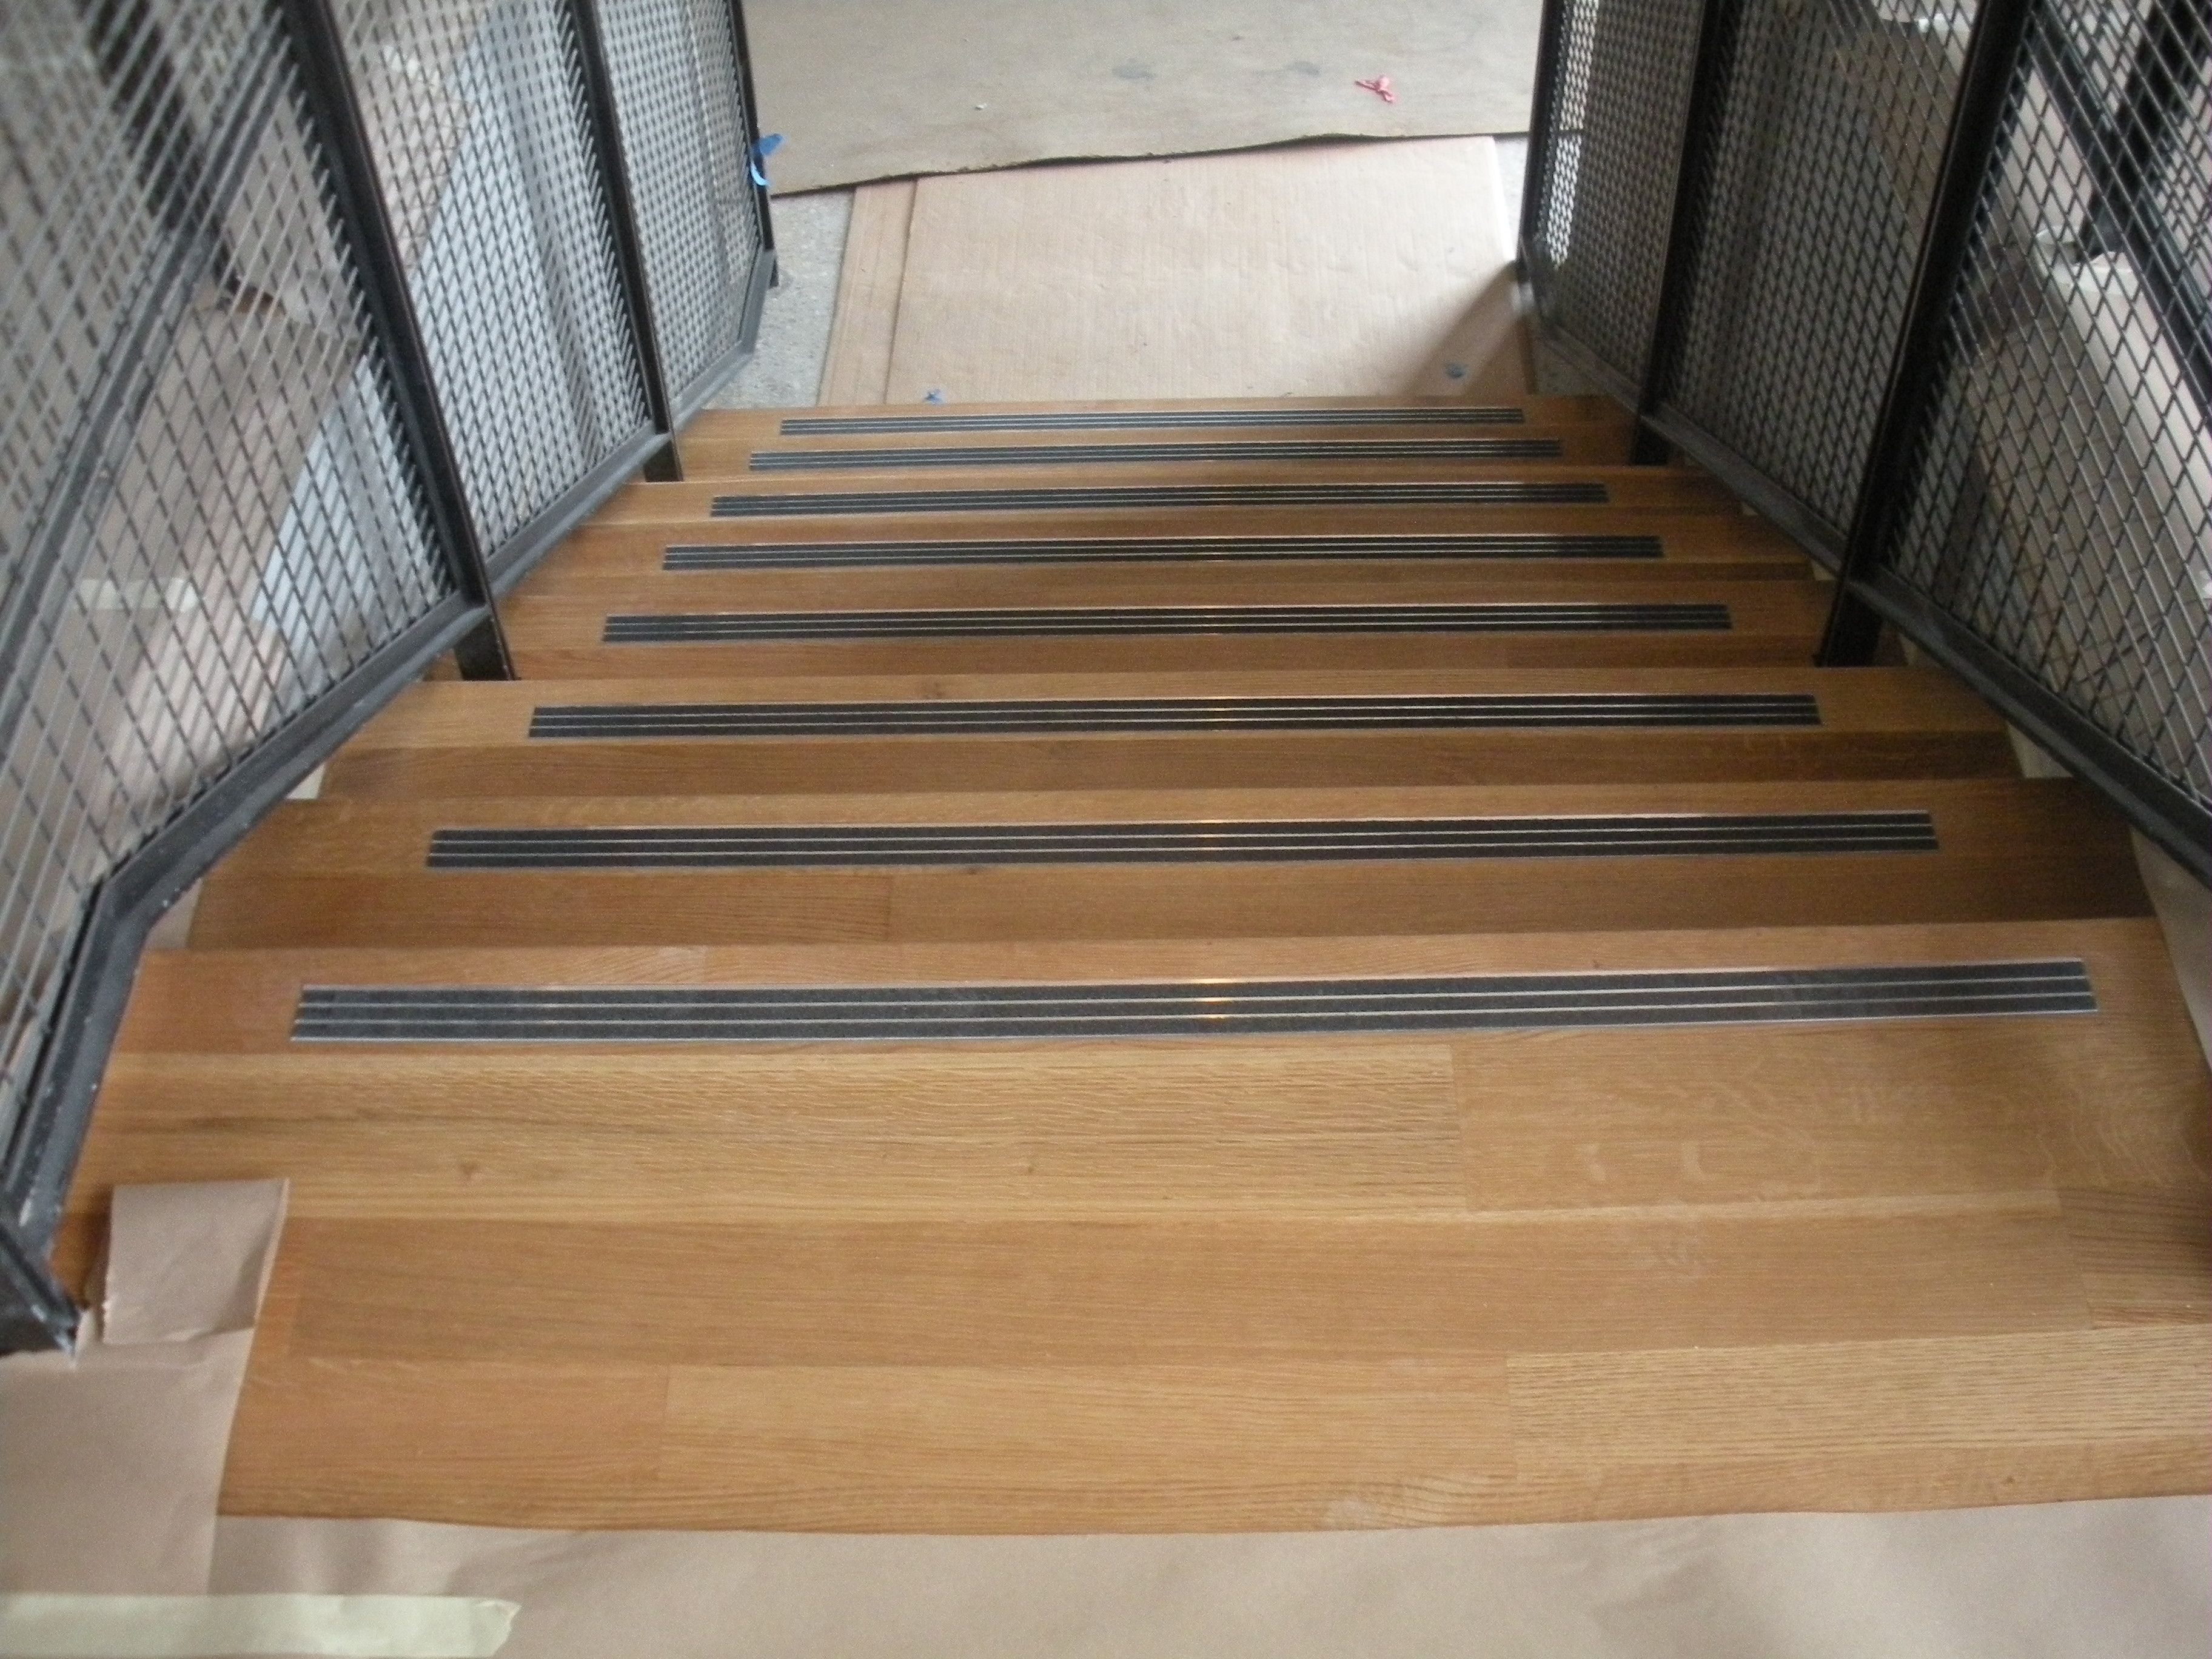 Antislip Abrasive Inlay Str*P Stair Railing Design Outdoor | Carpet Stair Treads Near Me | Flooring | Stair Runner | True Bullnose | Indoor Stair | Non Slip